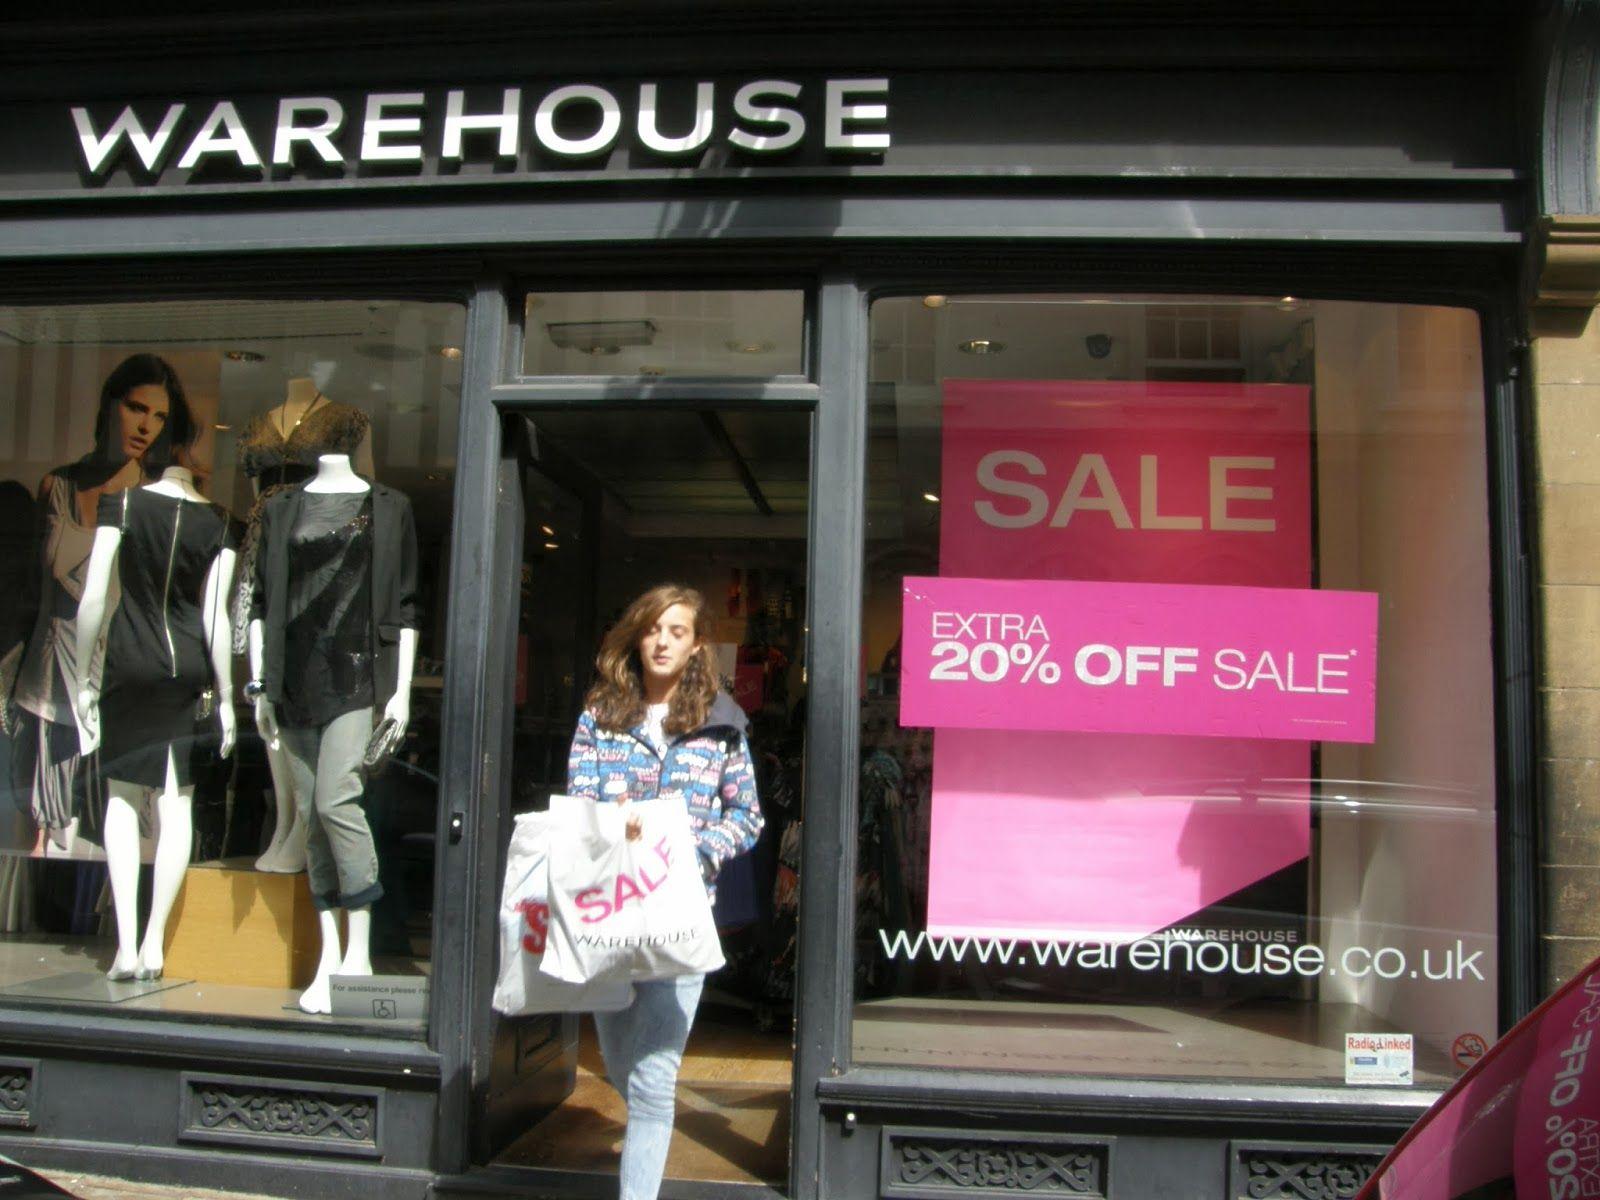 End of the Sales Sale, Retirement lifestyle, Retirement